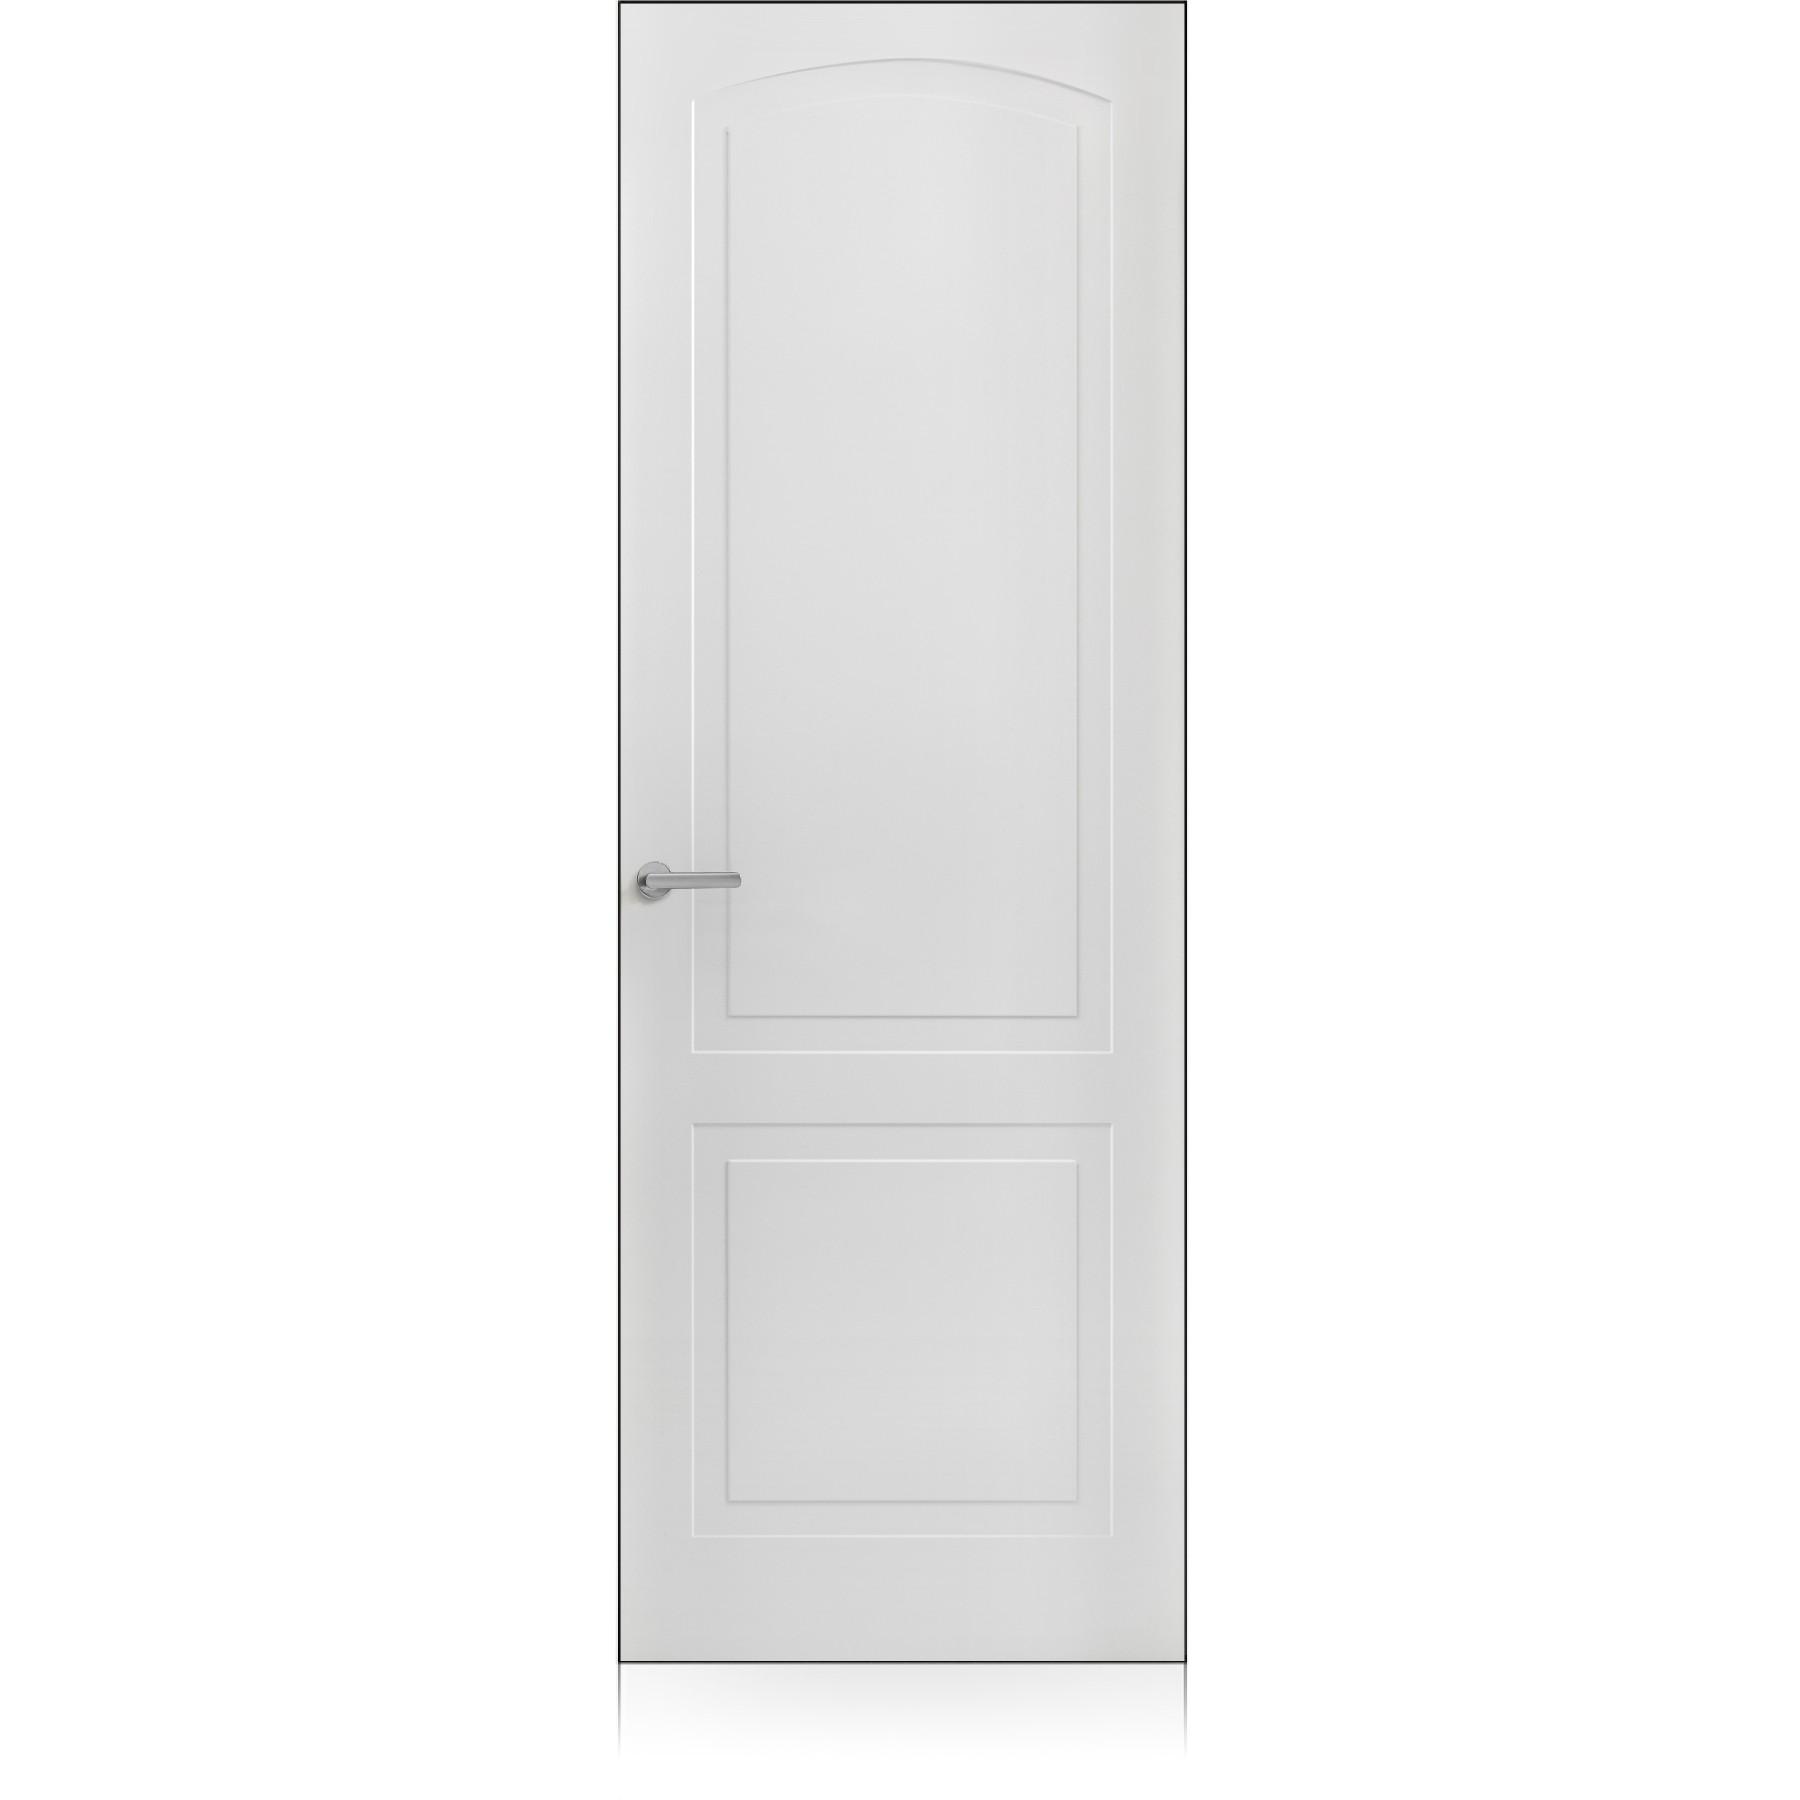 Porta Mixy / 3 Zero bianco